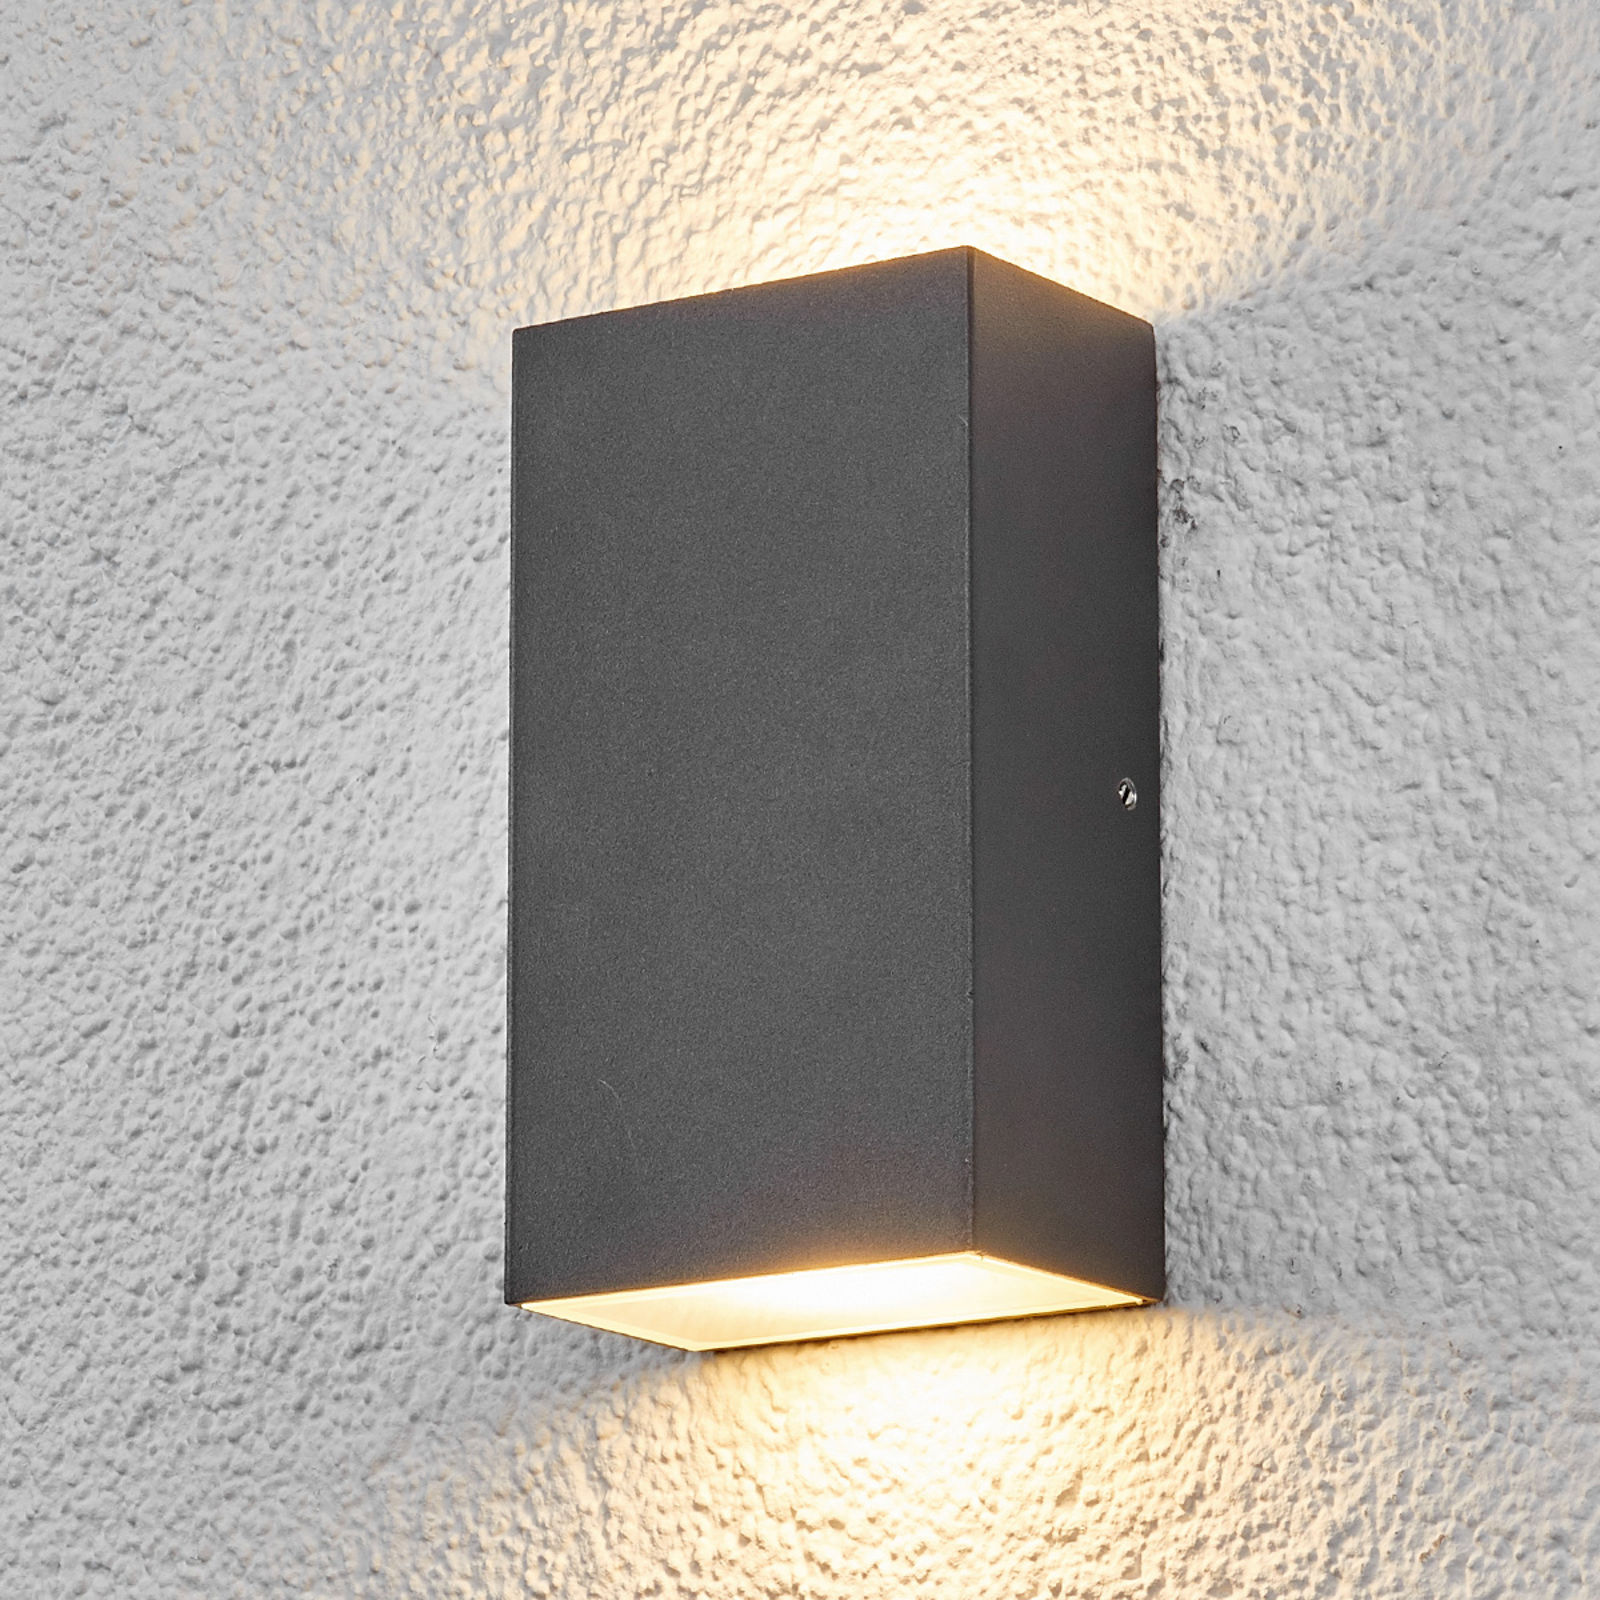 Prostokątna lampa zewnętrzna LED WEERD